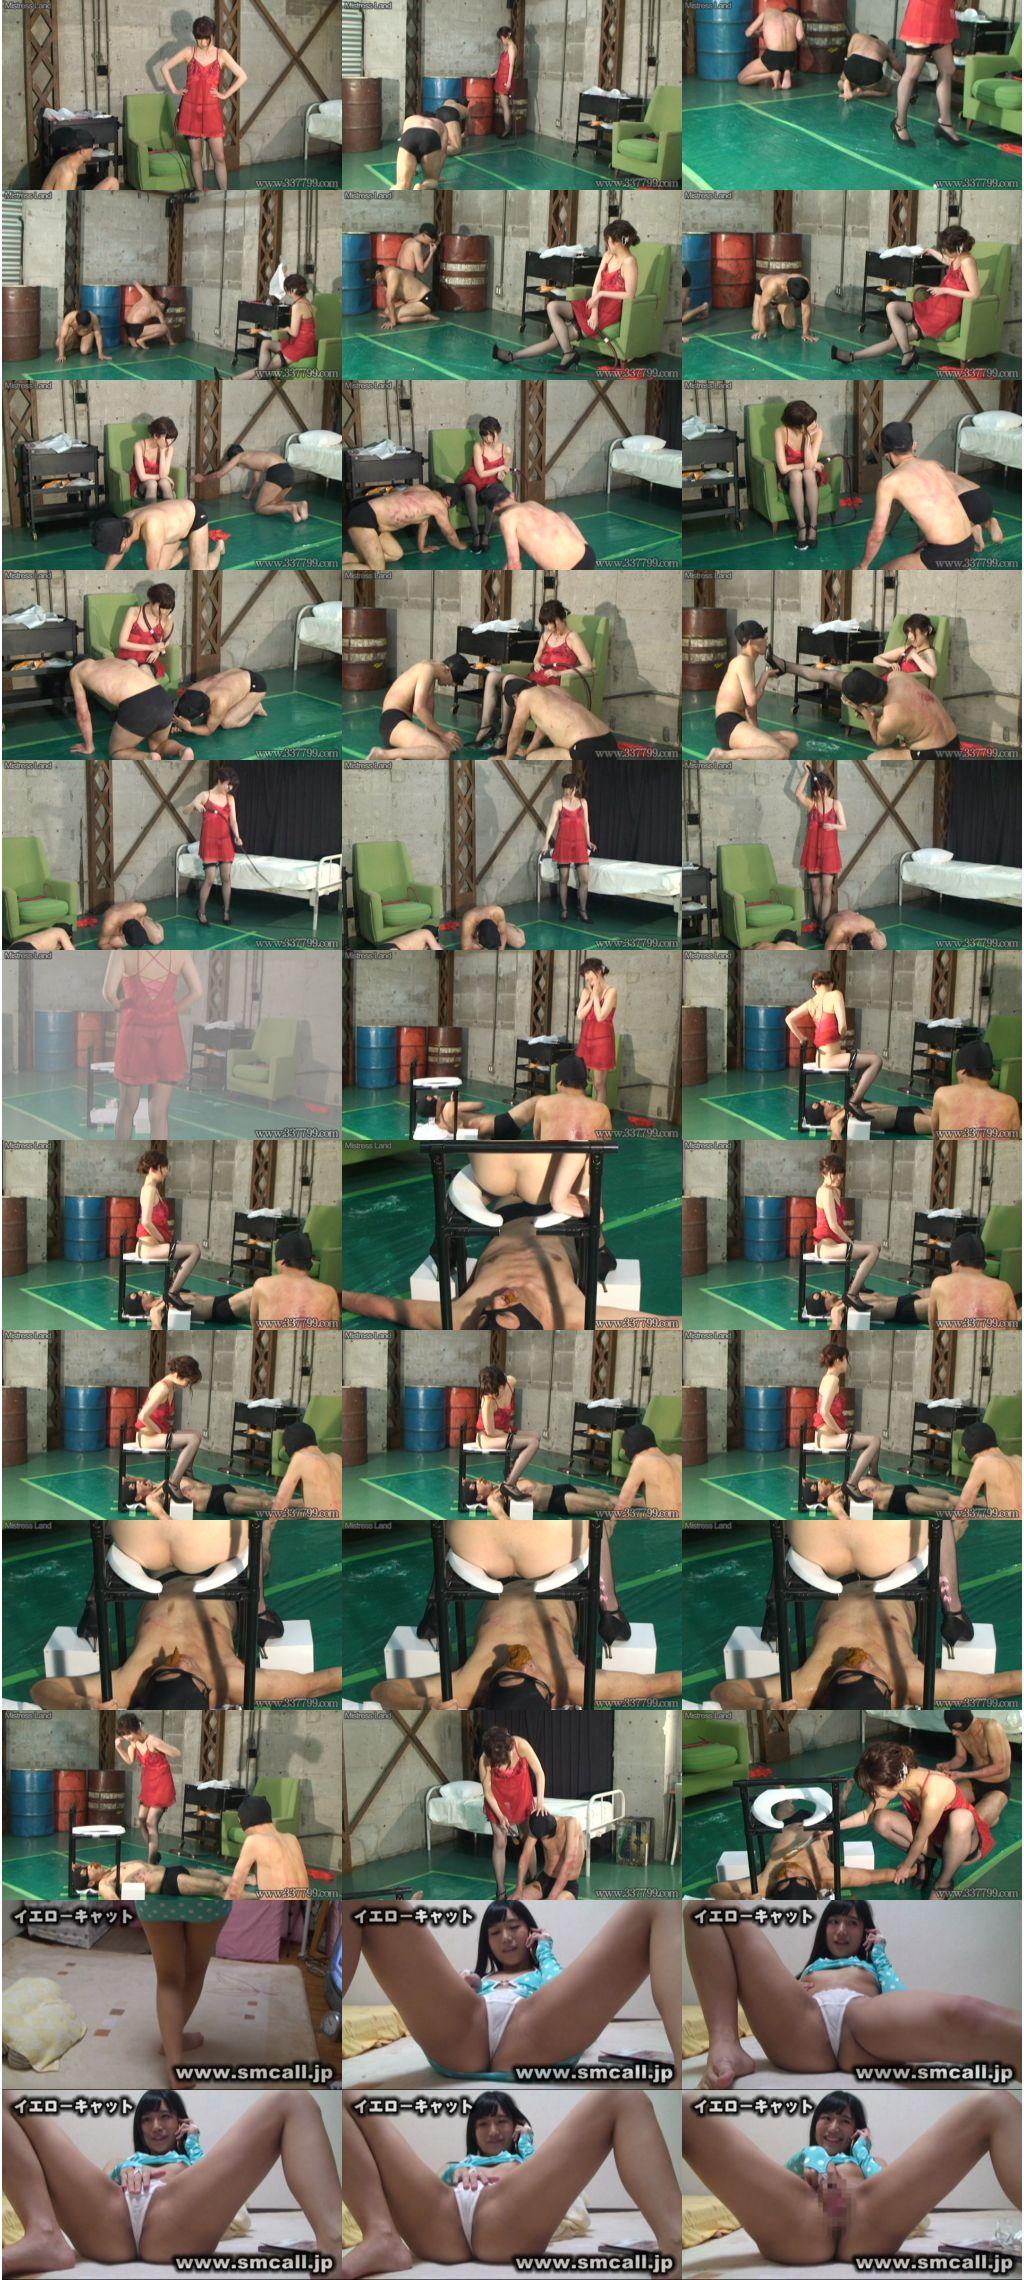 mldo 147 6 s - [MLDO-147] サド女研究者のマゾ男人体実験 麻美   Scat  Pissing SM スパンキング・鞭打ち